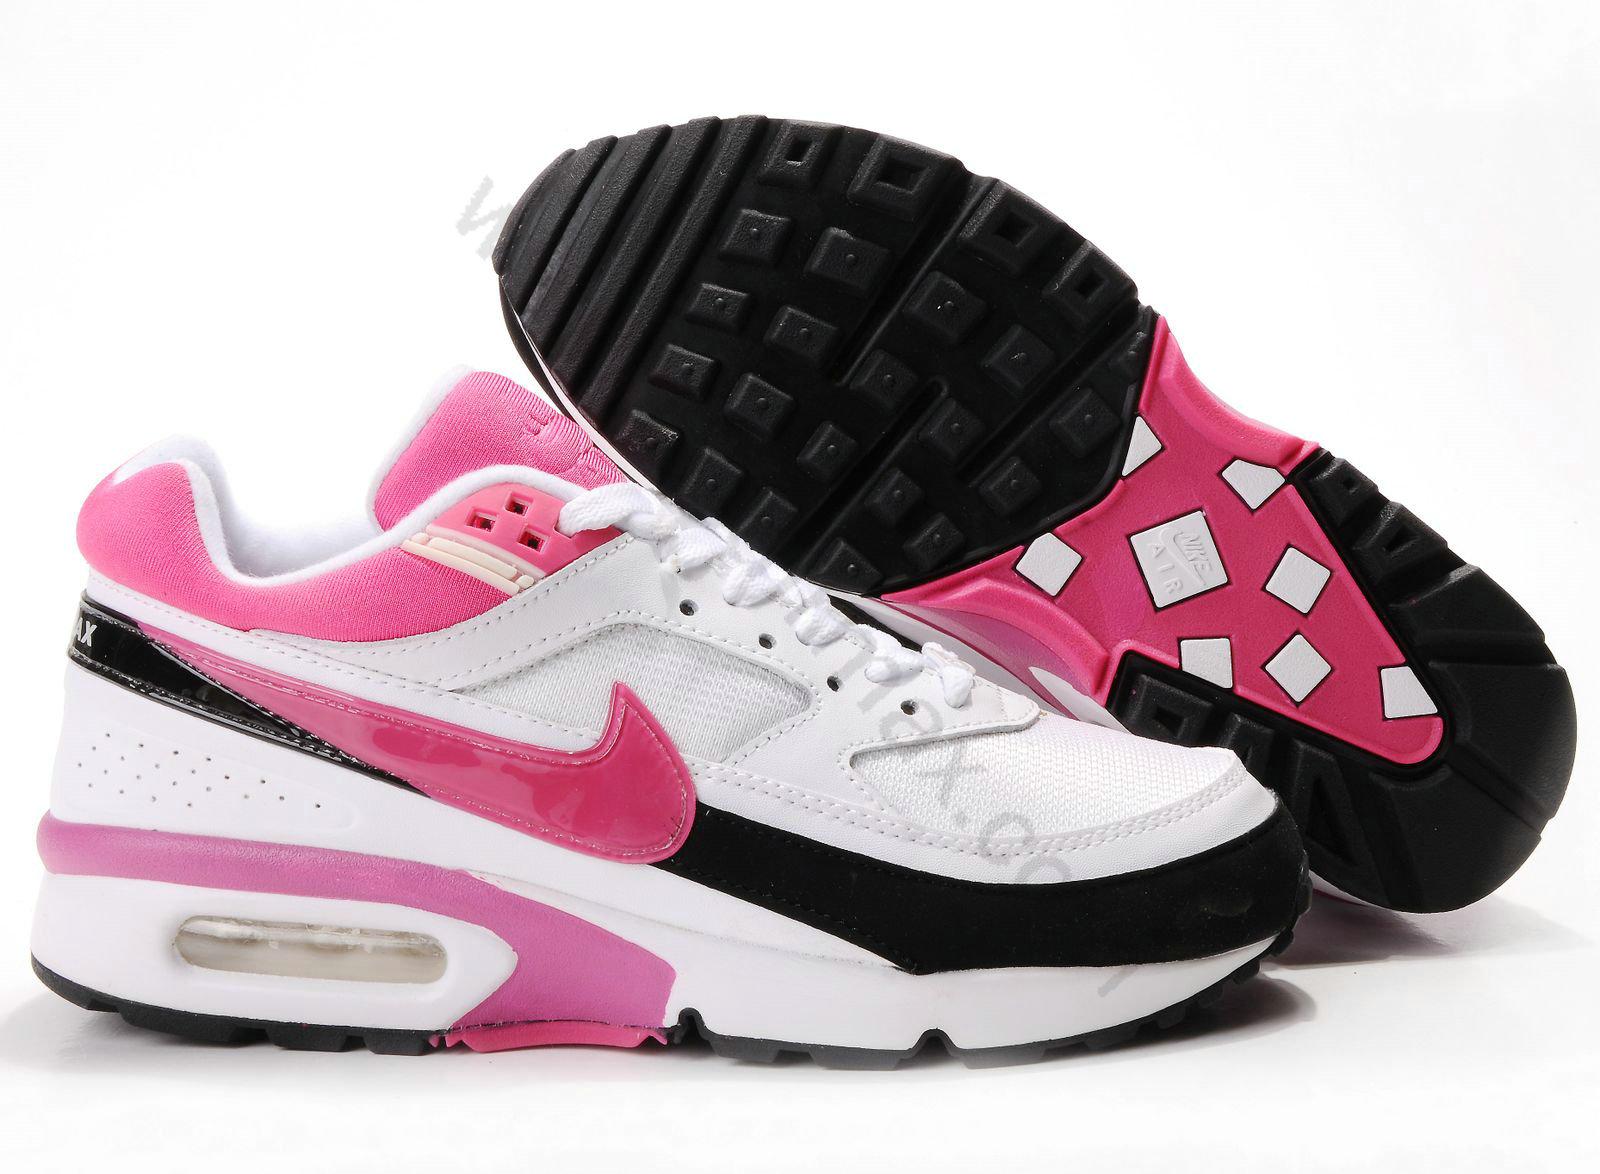 san francisco 33265 39b90 Chaussures Nike air max BW femme Pas cher Blanc Noir et Rouge,baskets nike,